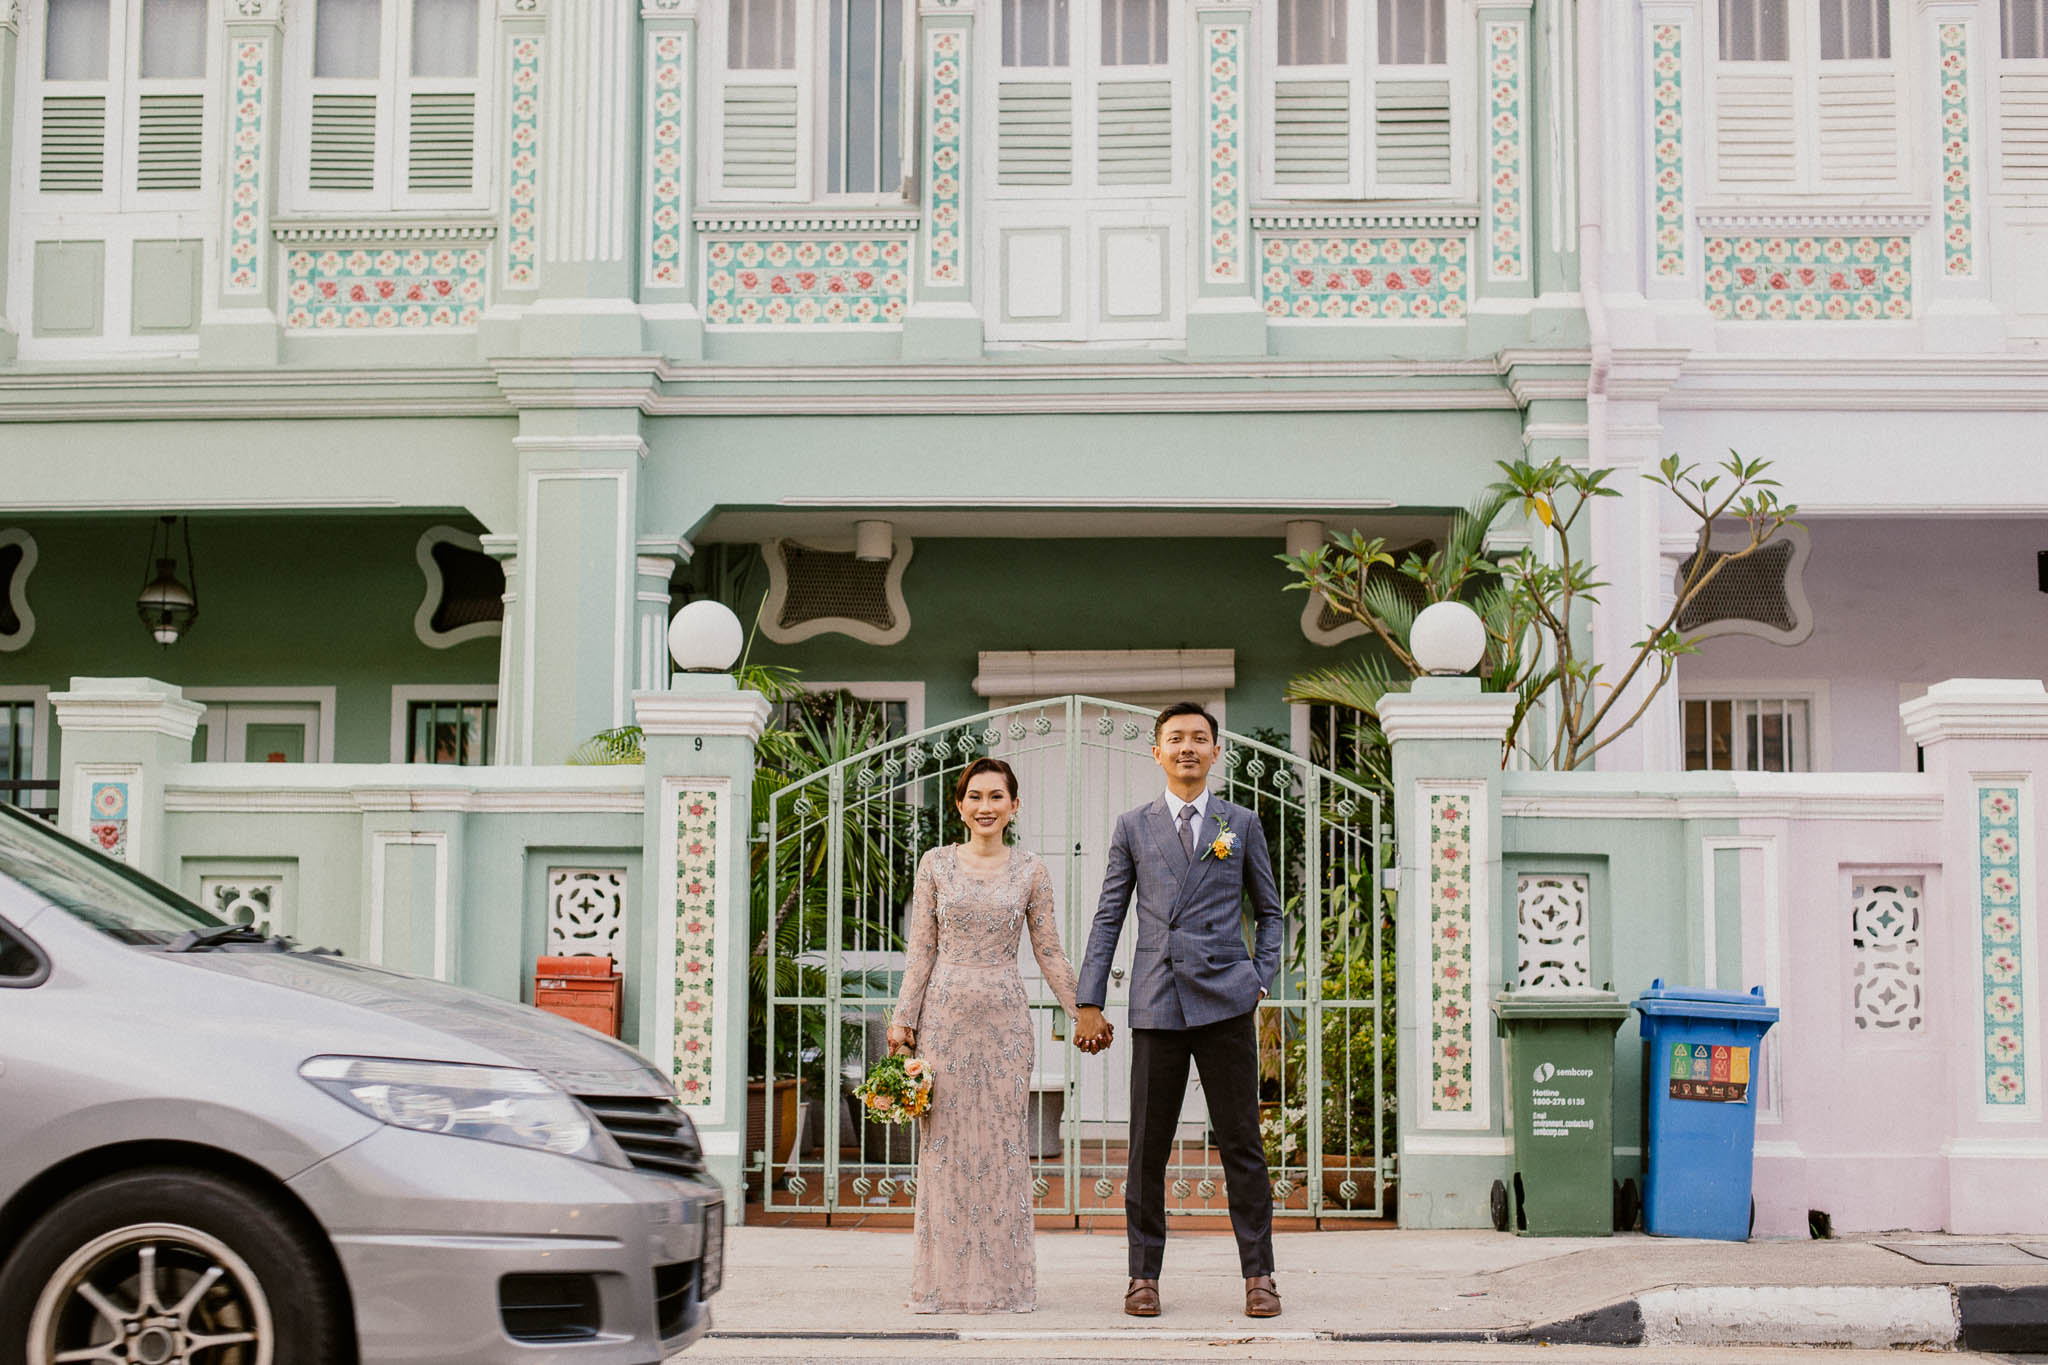 singapore-wedding-photographer-addafiq-nufail-076.jpg